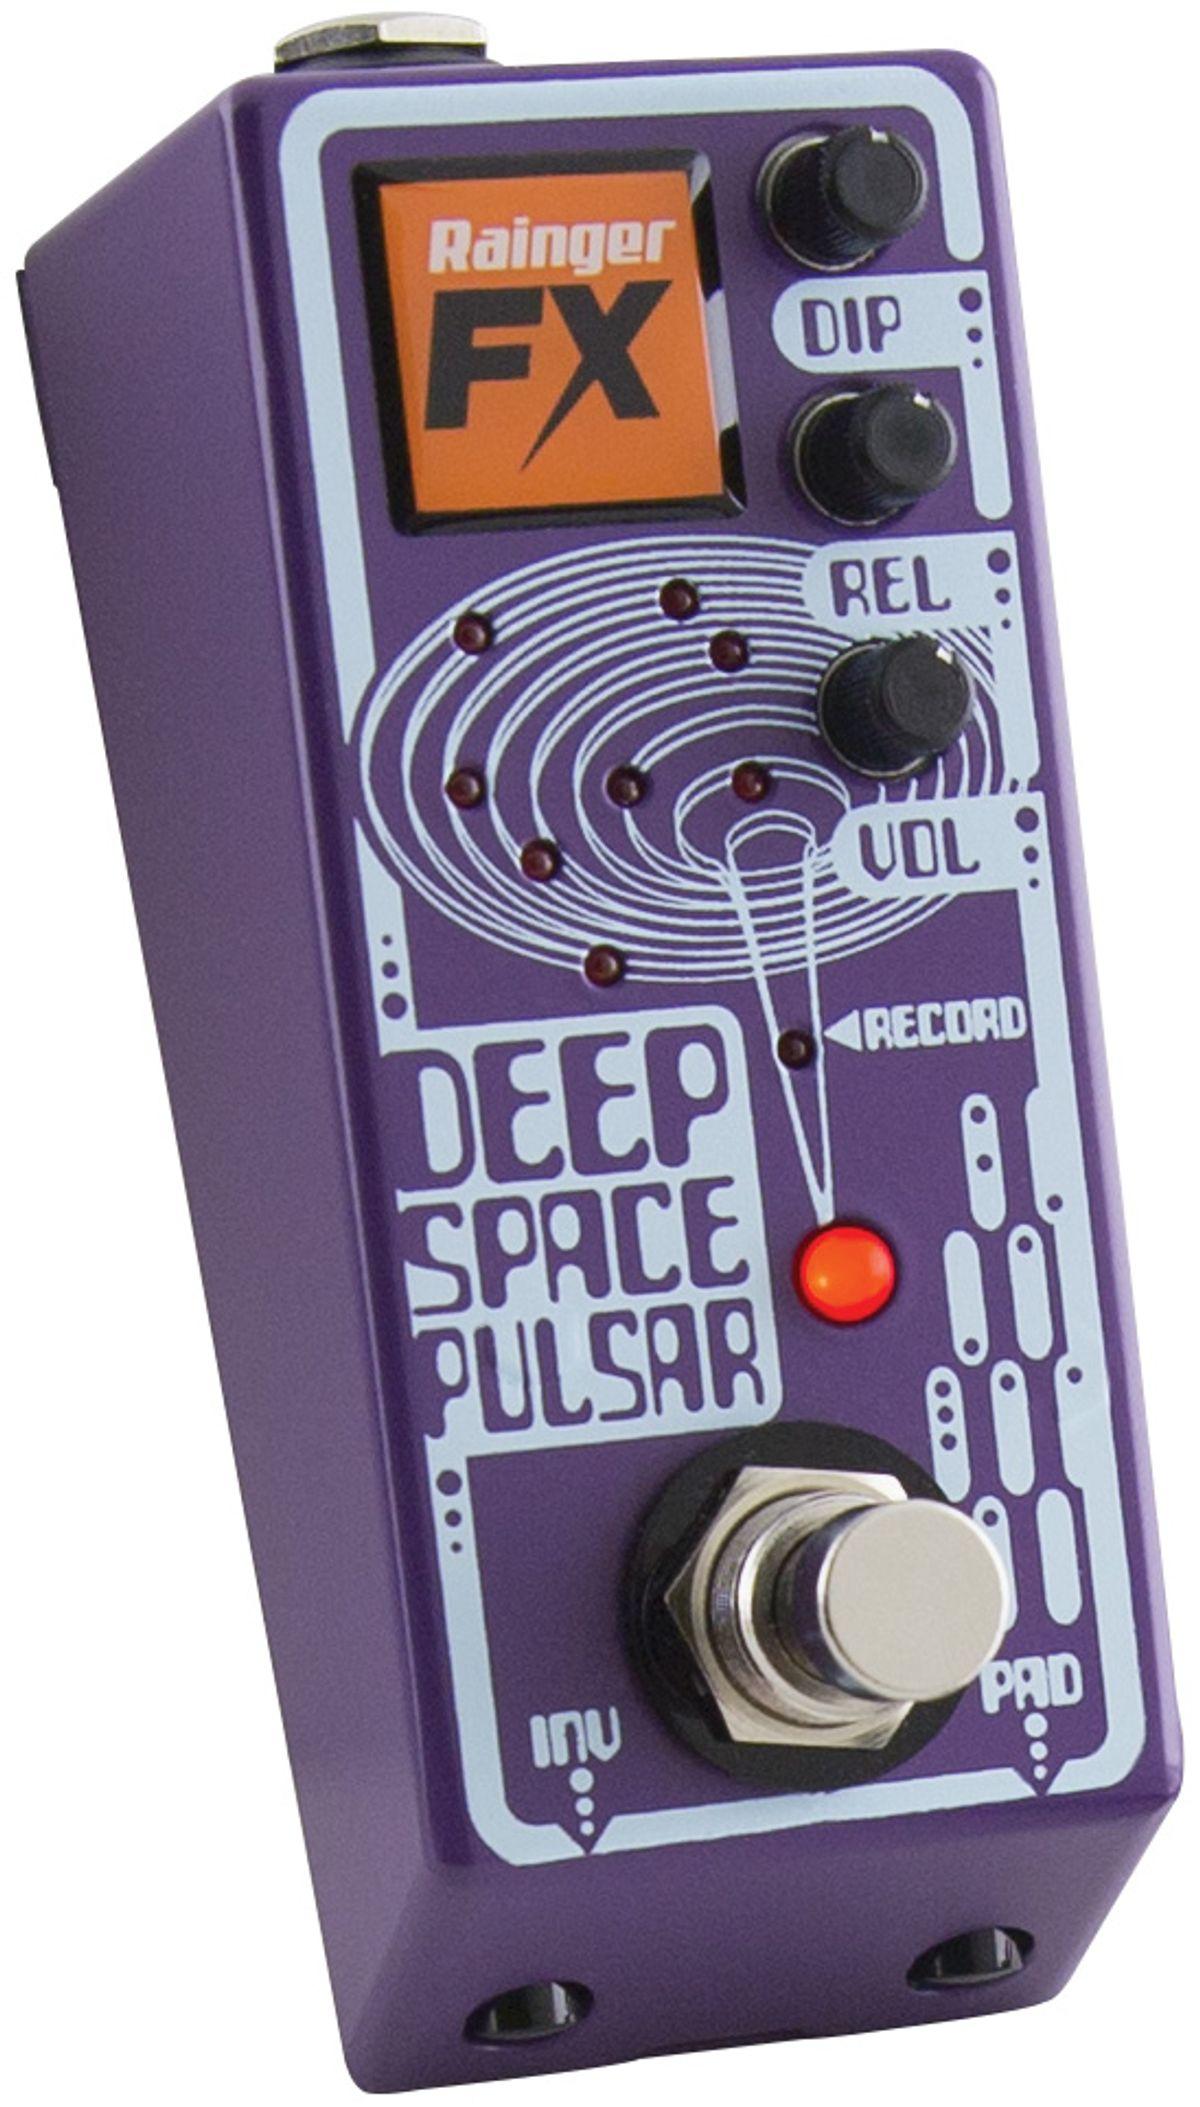 Rainger FX Deep Space Pulsar Review